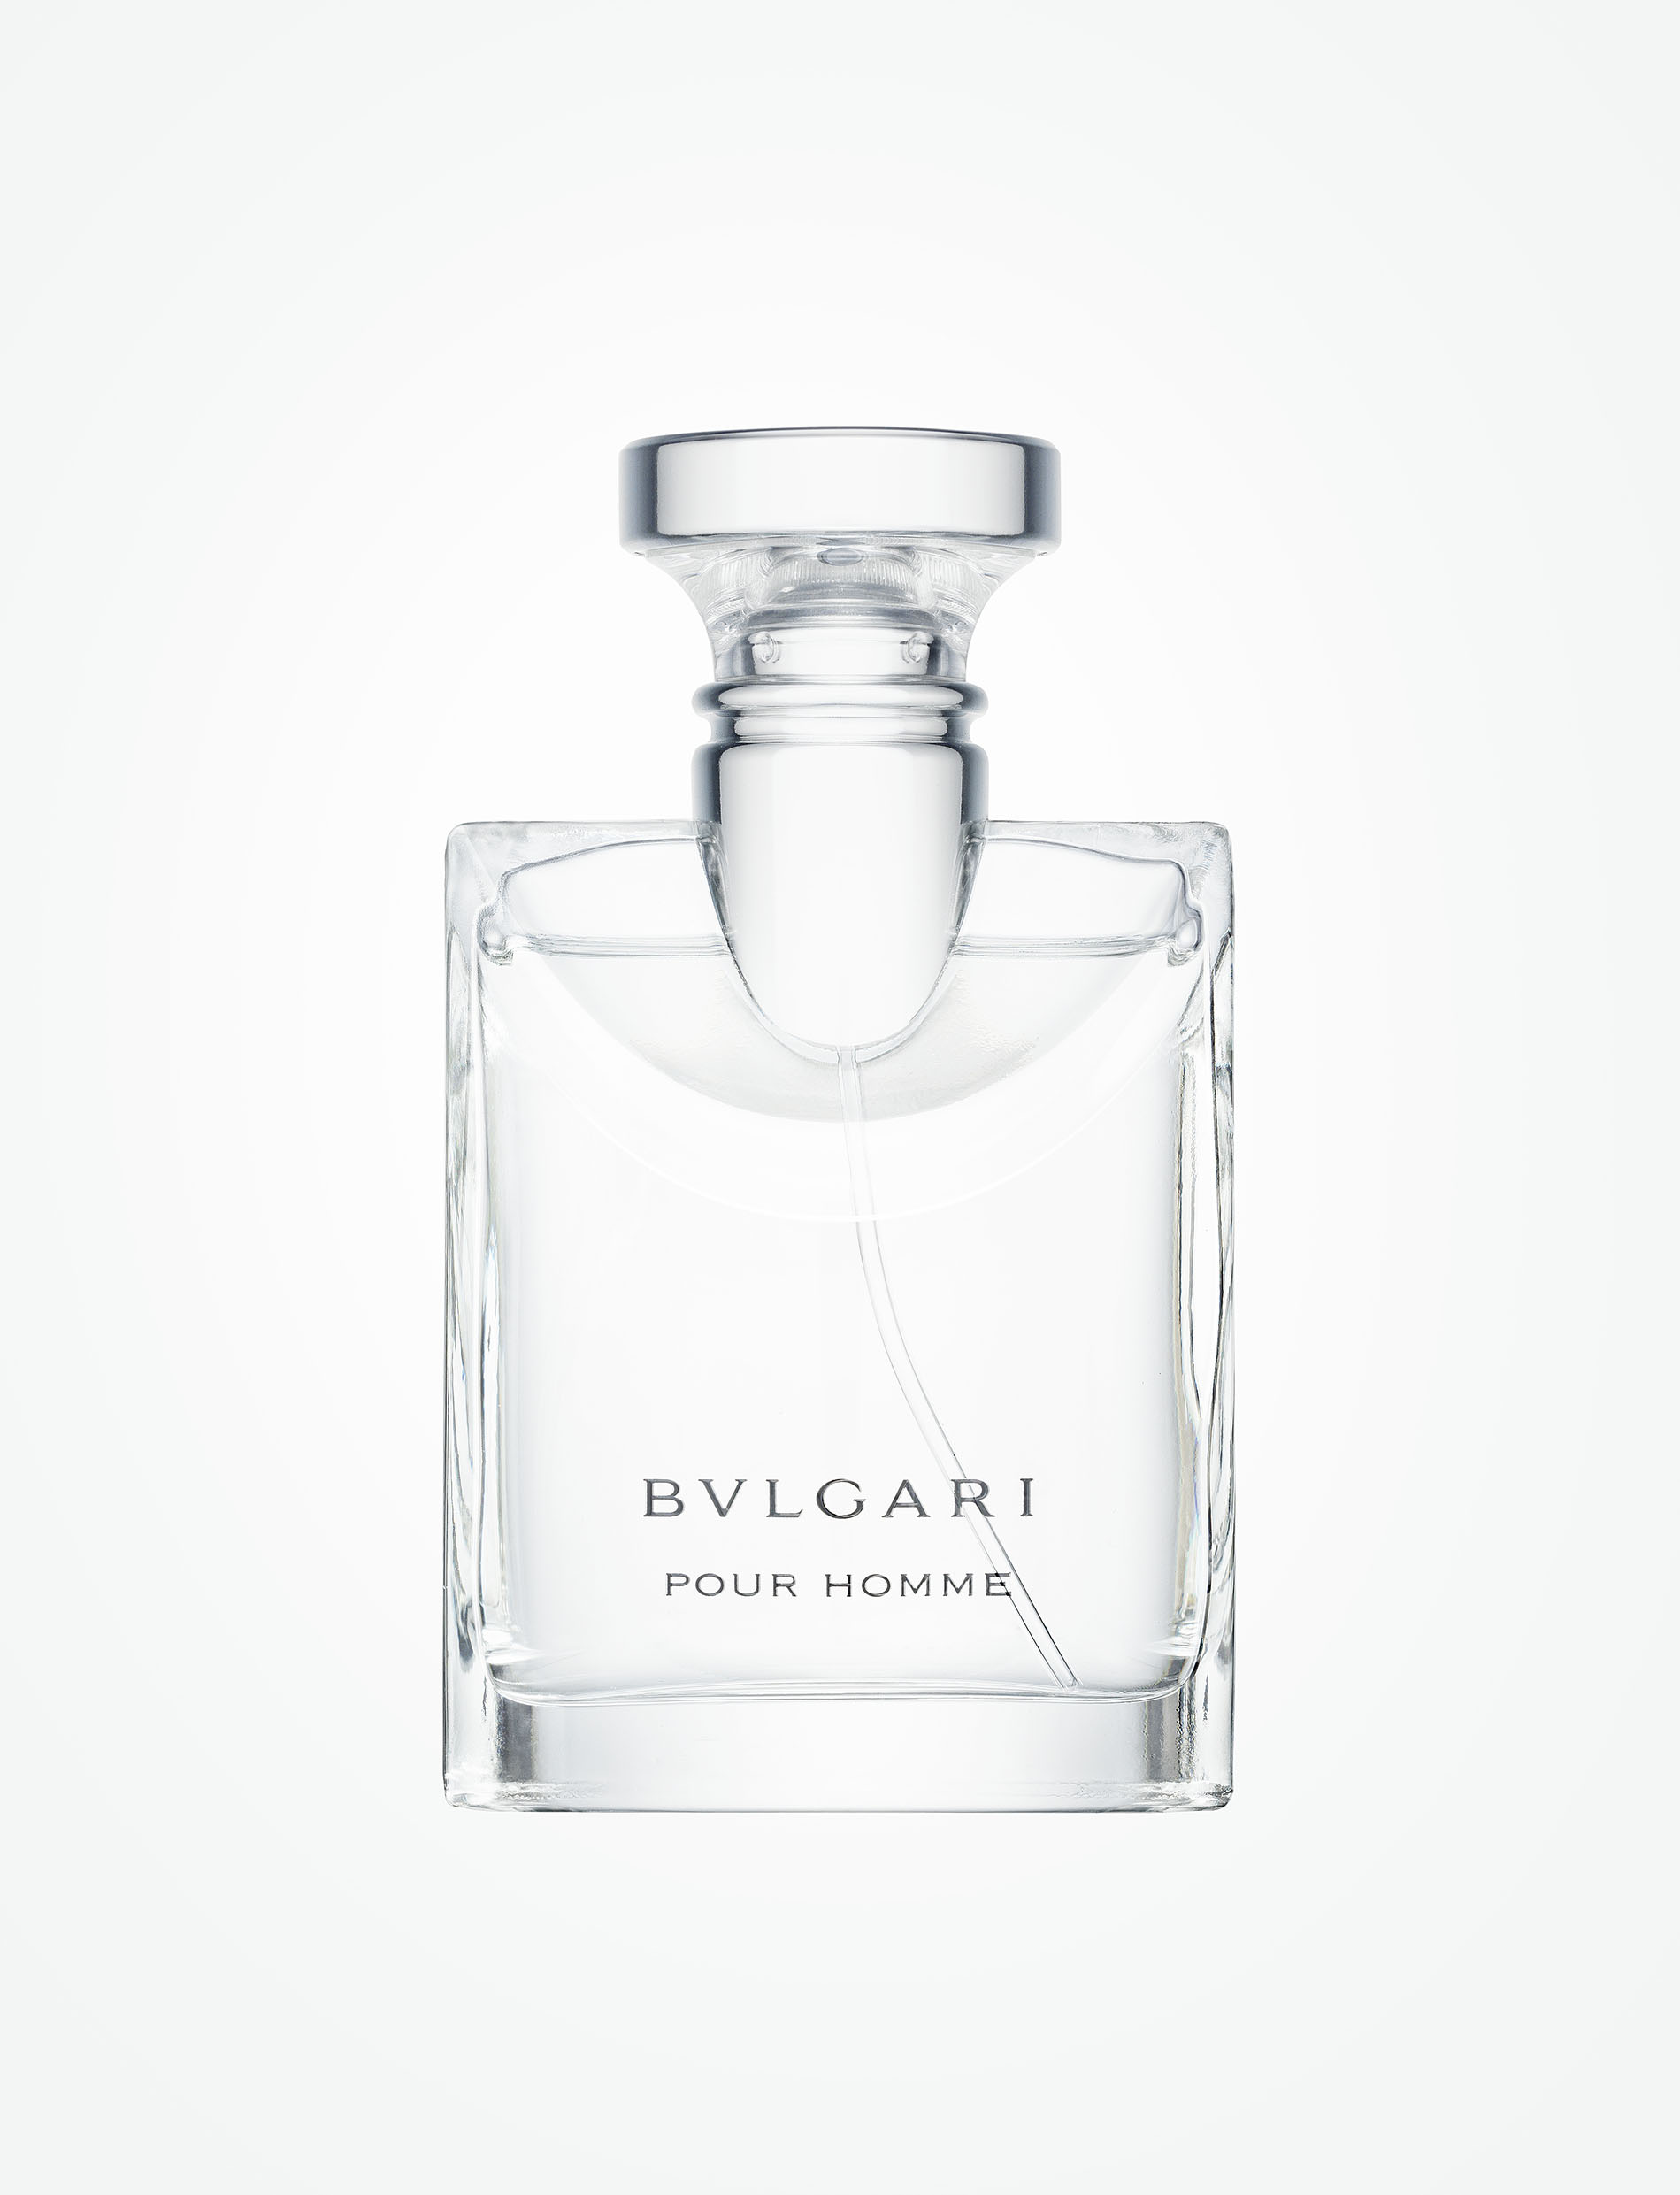 bvlgari_pour_homme_H05.jpg